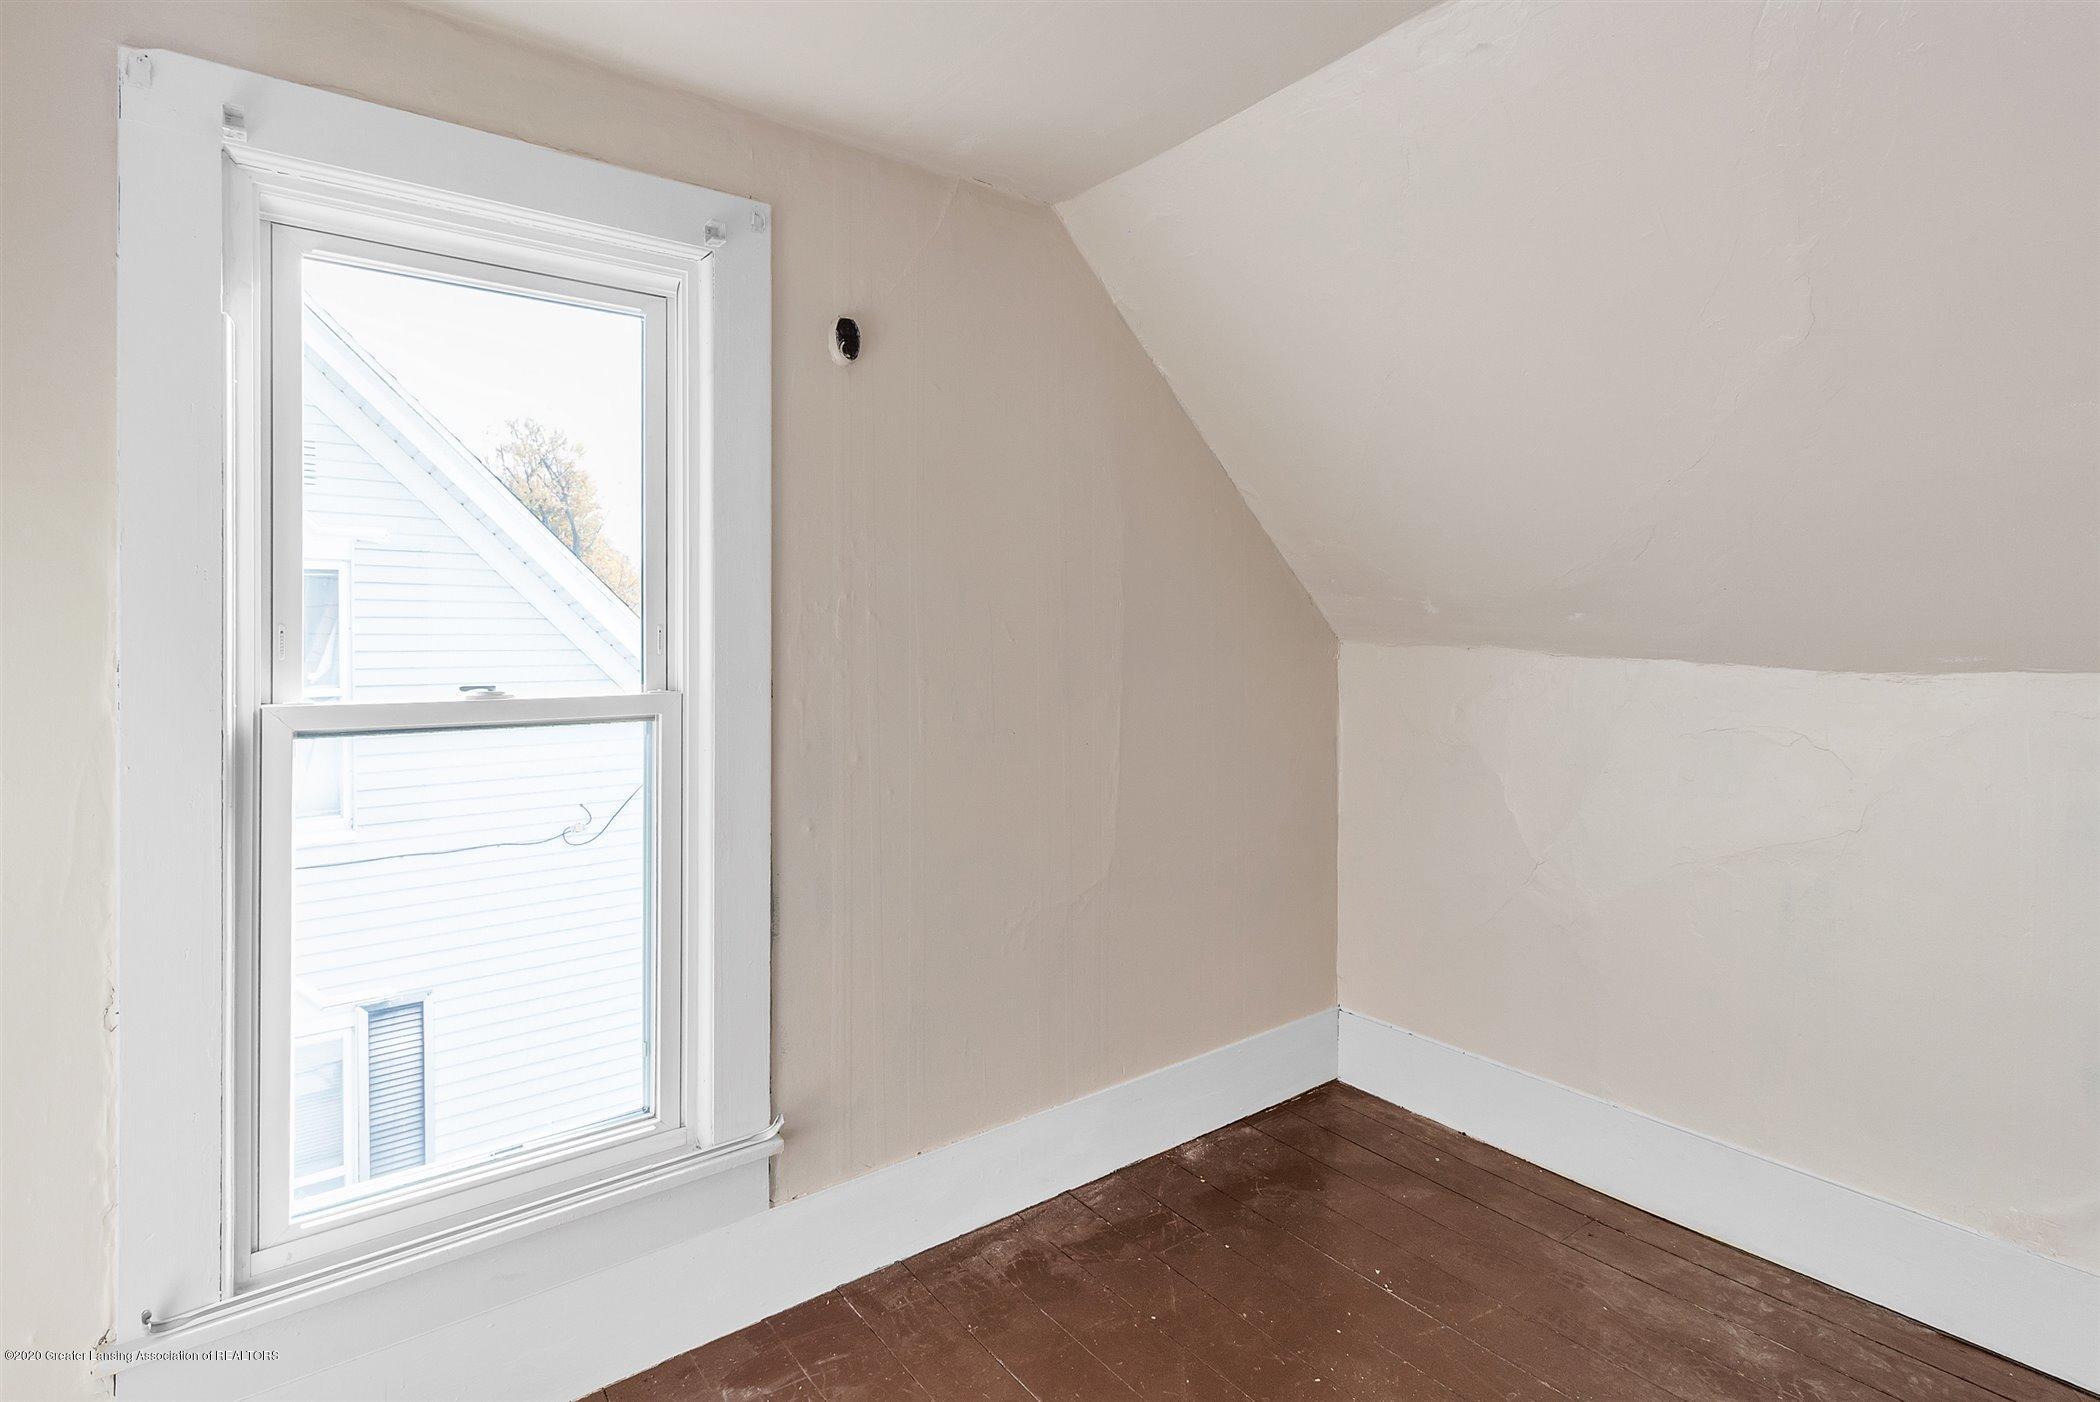 114 E Knight St - Upstairs bedroom #1 - 22